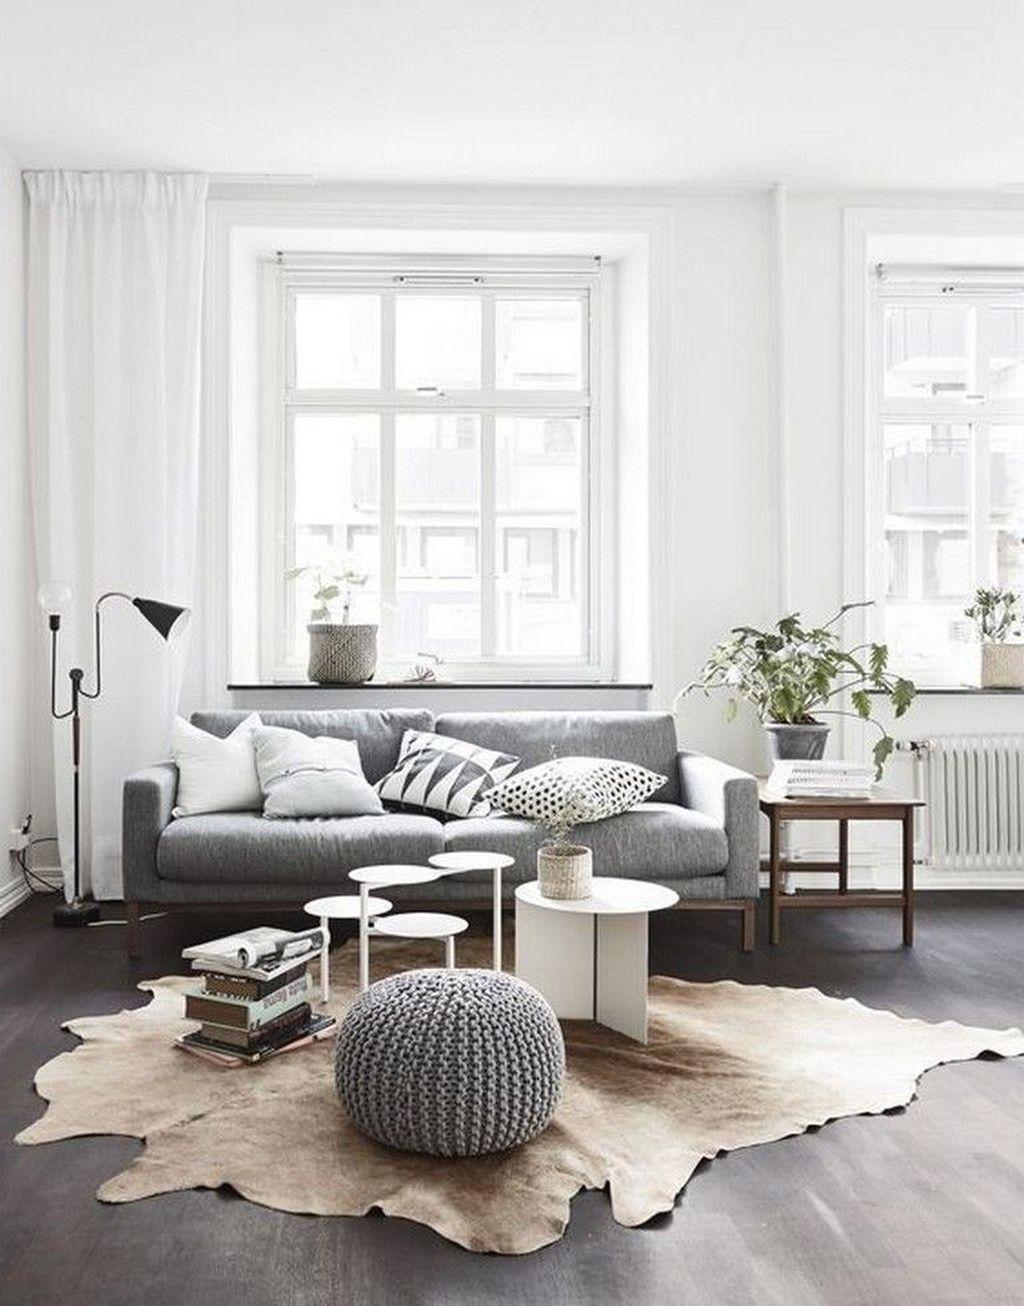 40 Stunning Scandinavian Living Room Decor Ideas With Nordic Style Living Room Scandinavian Scandinavian Decor Living Room Living Room Decor Modern